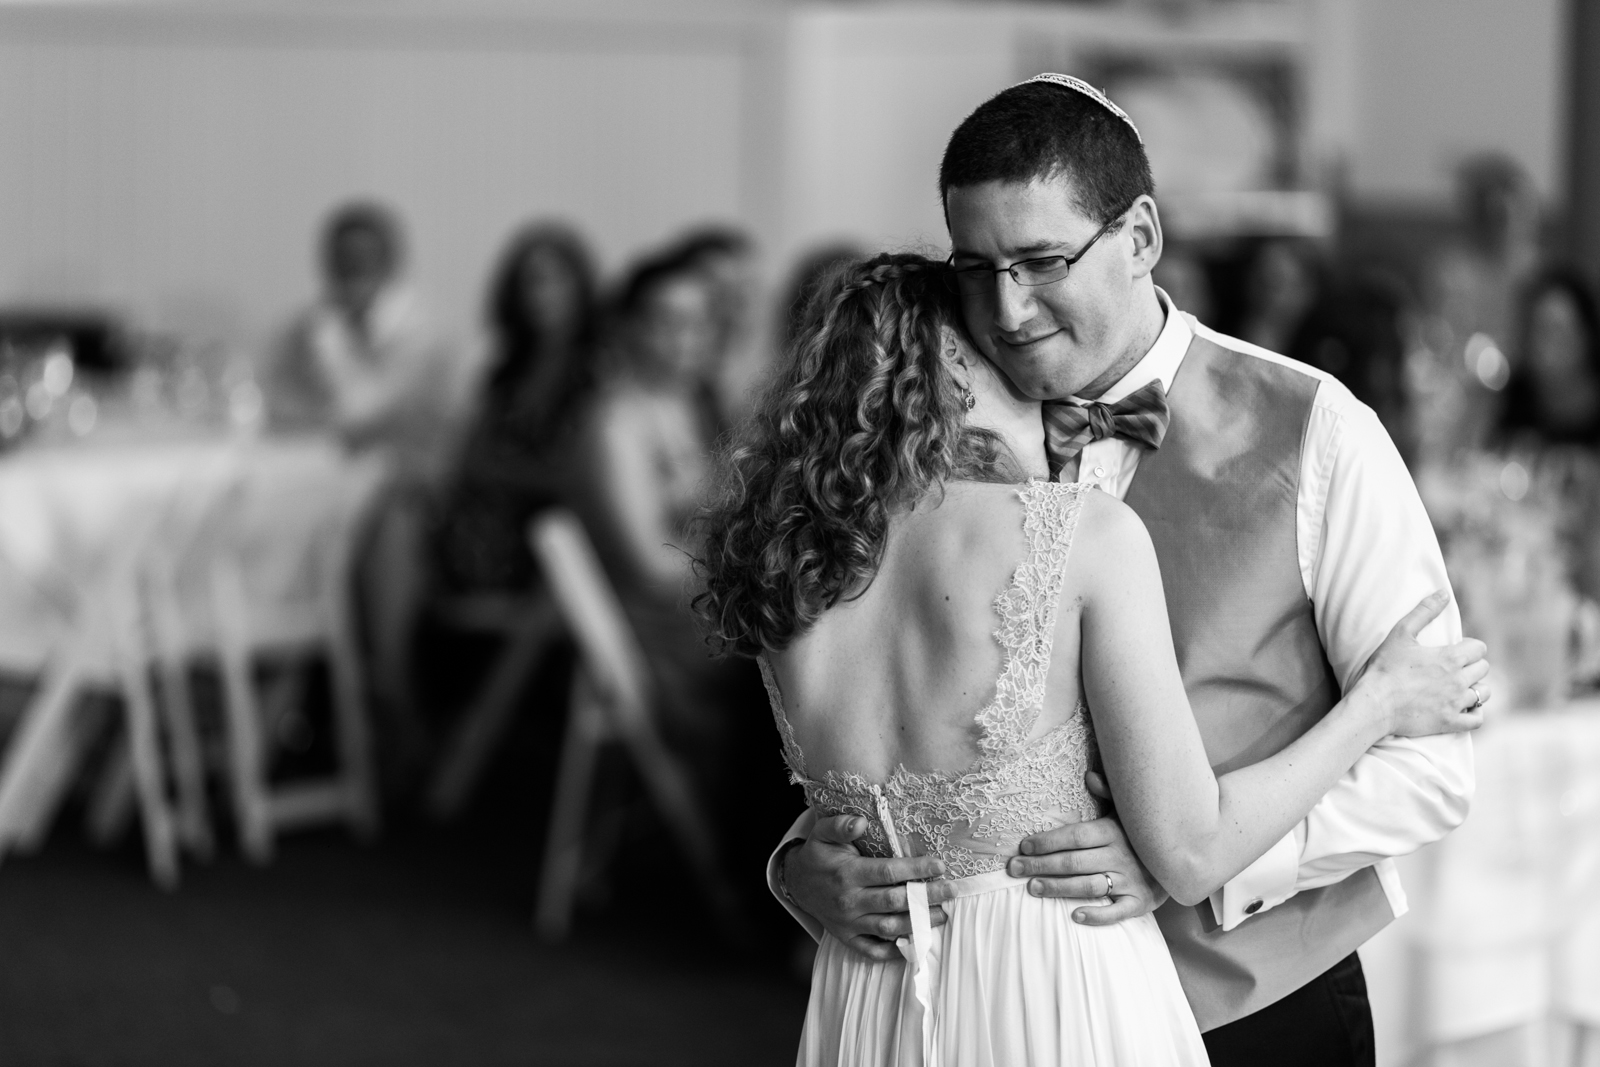 newlyweds reception dancing